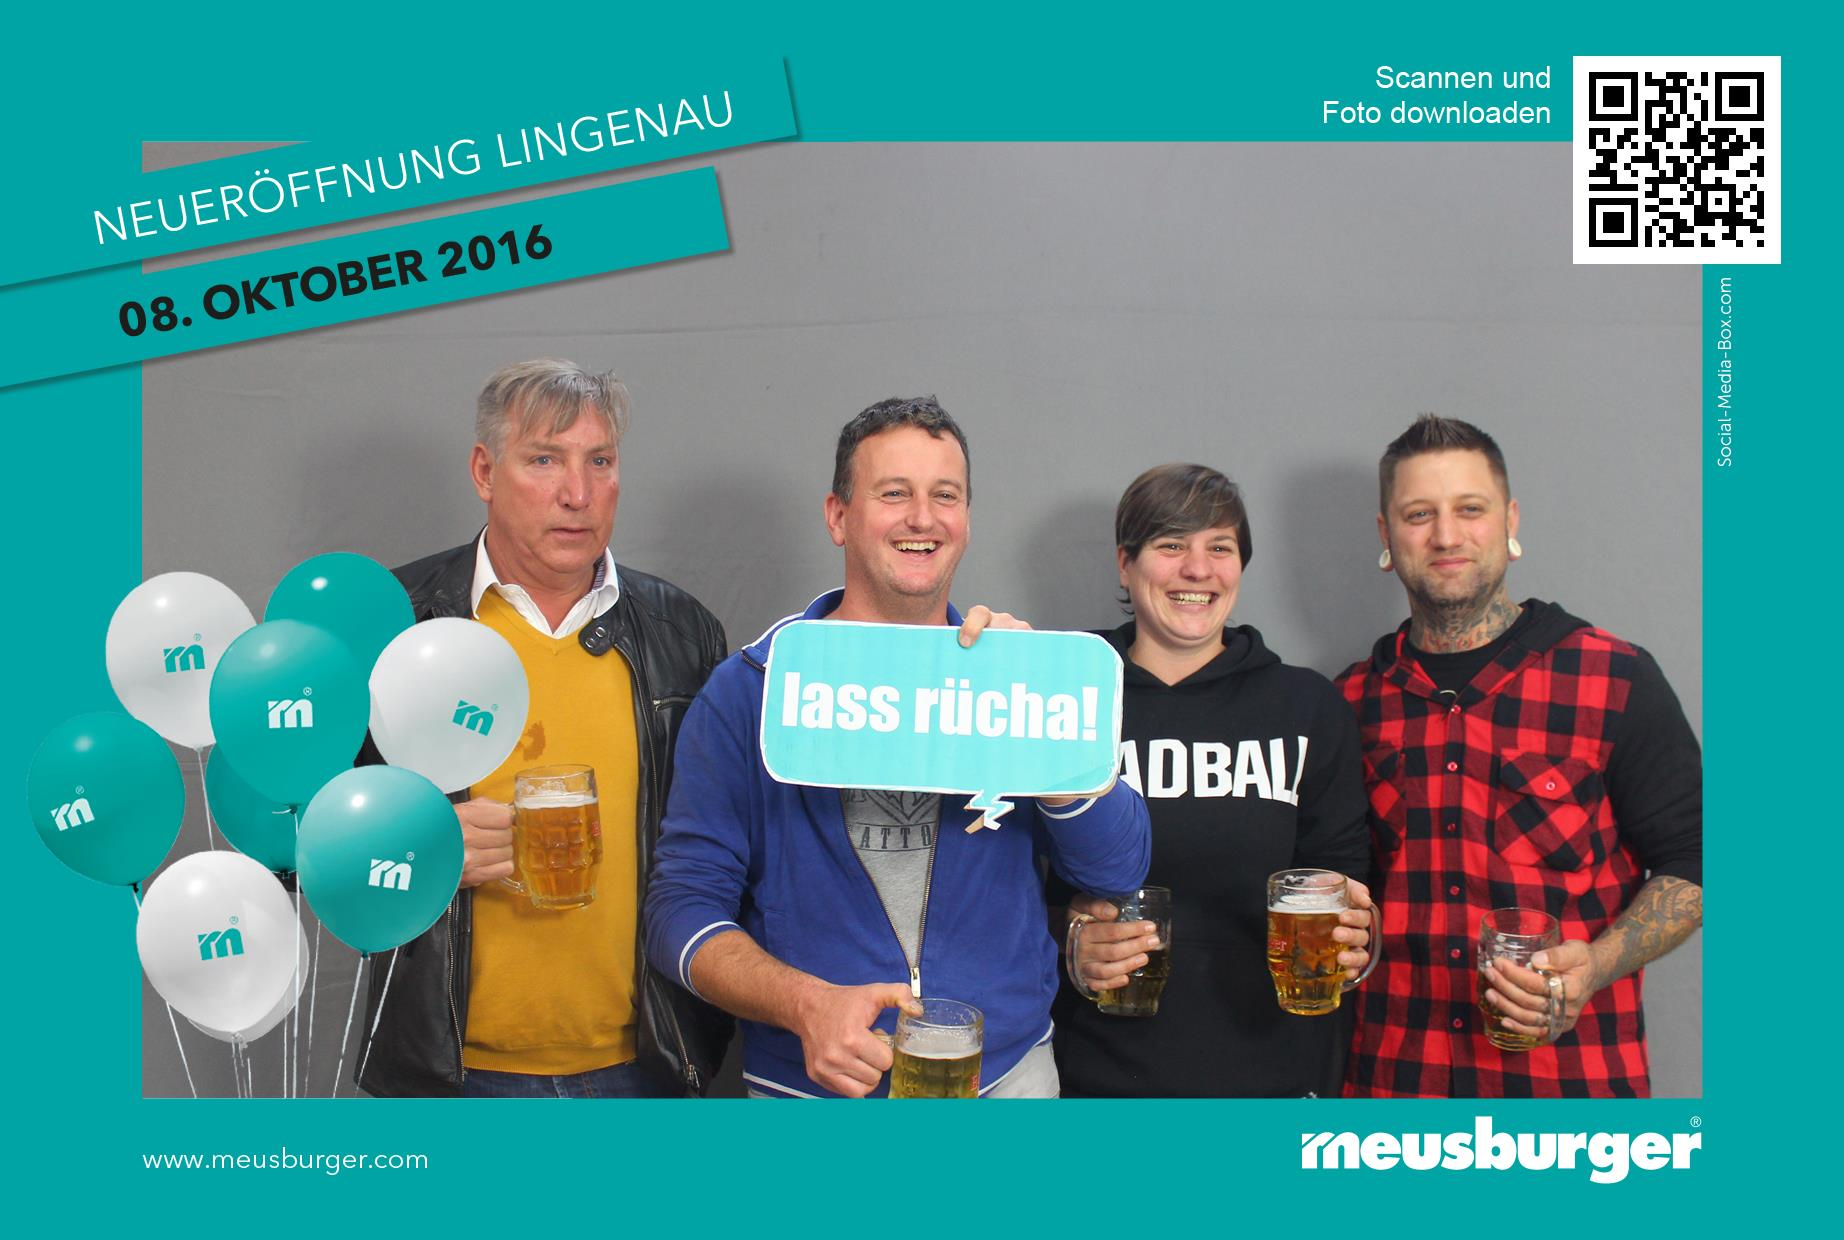 Meusburger Tag der offenen Tür Lingenau